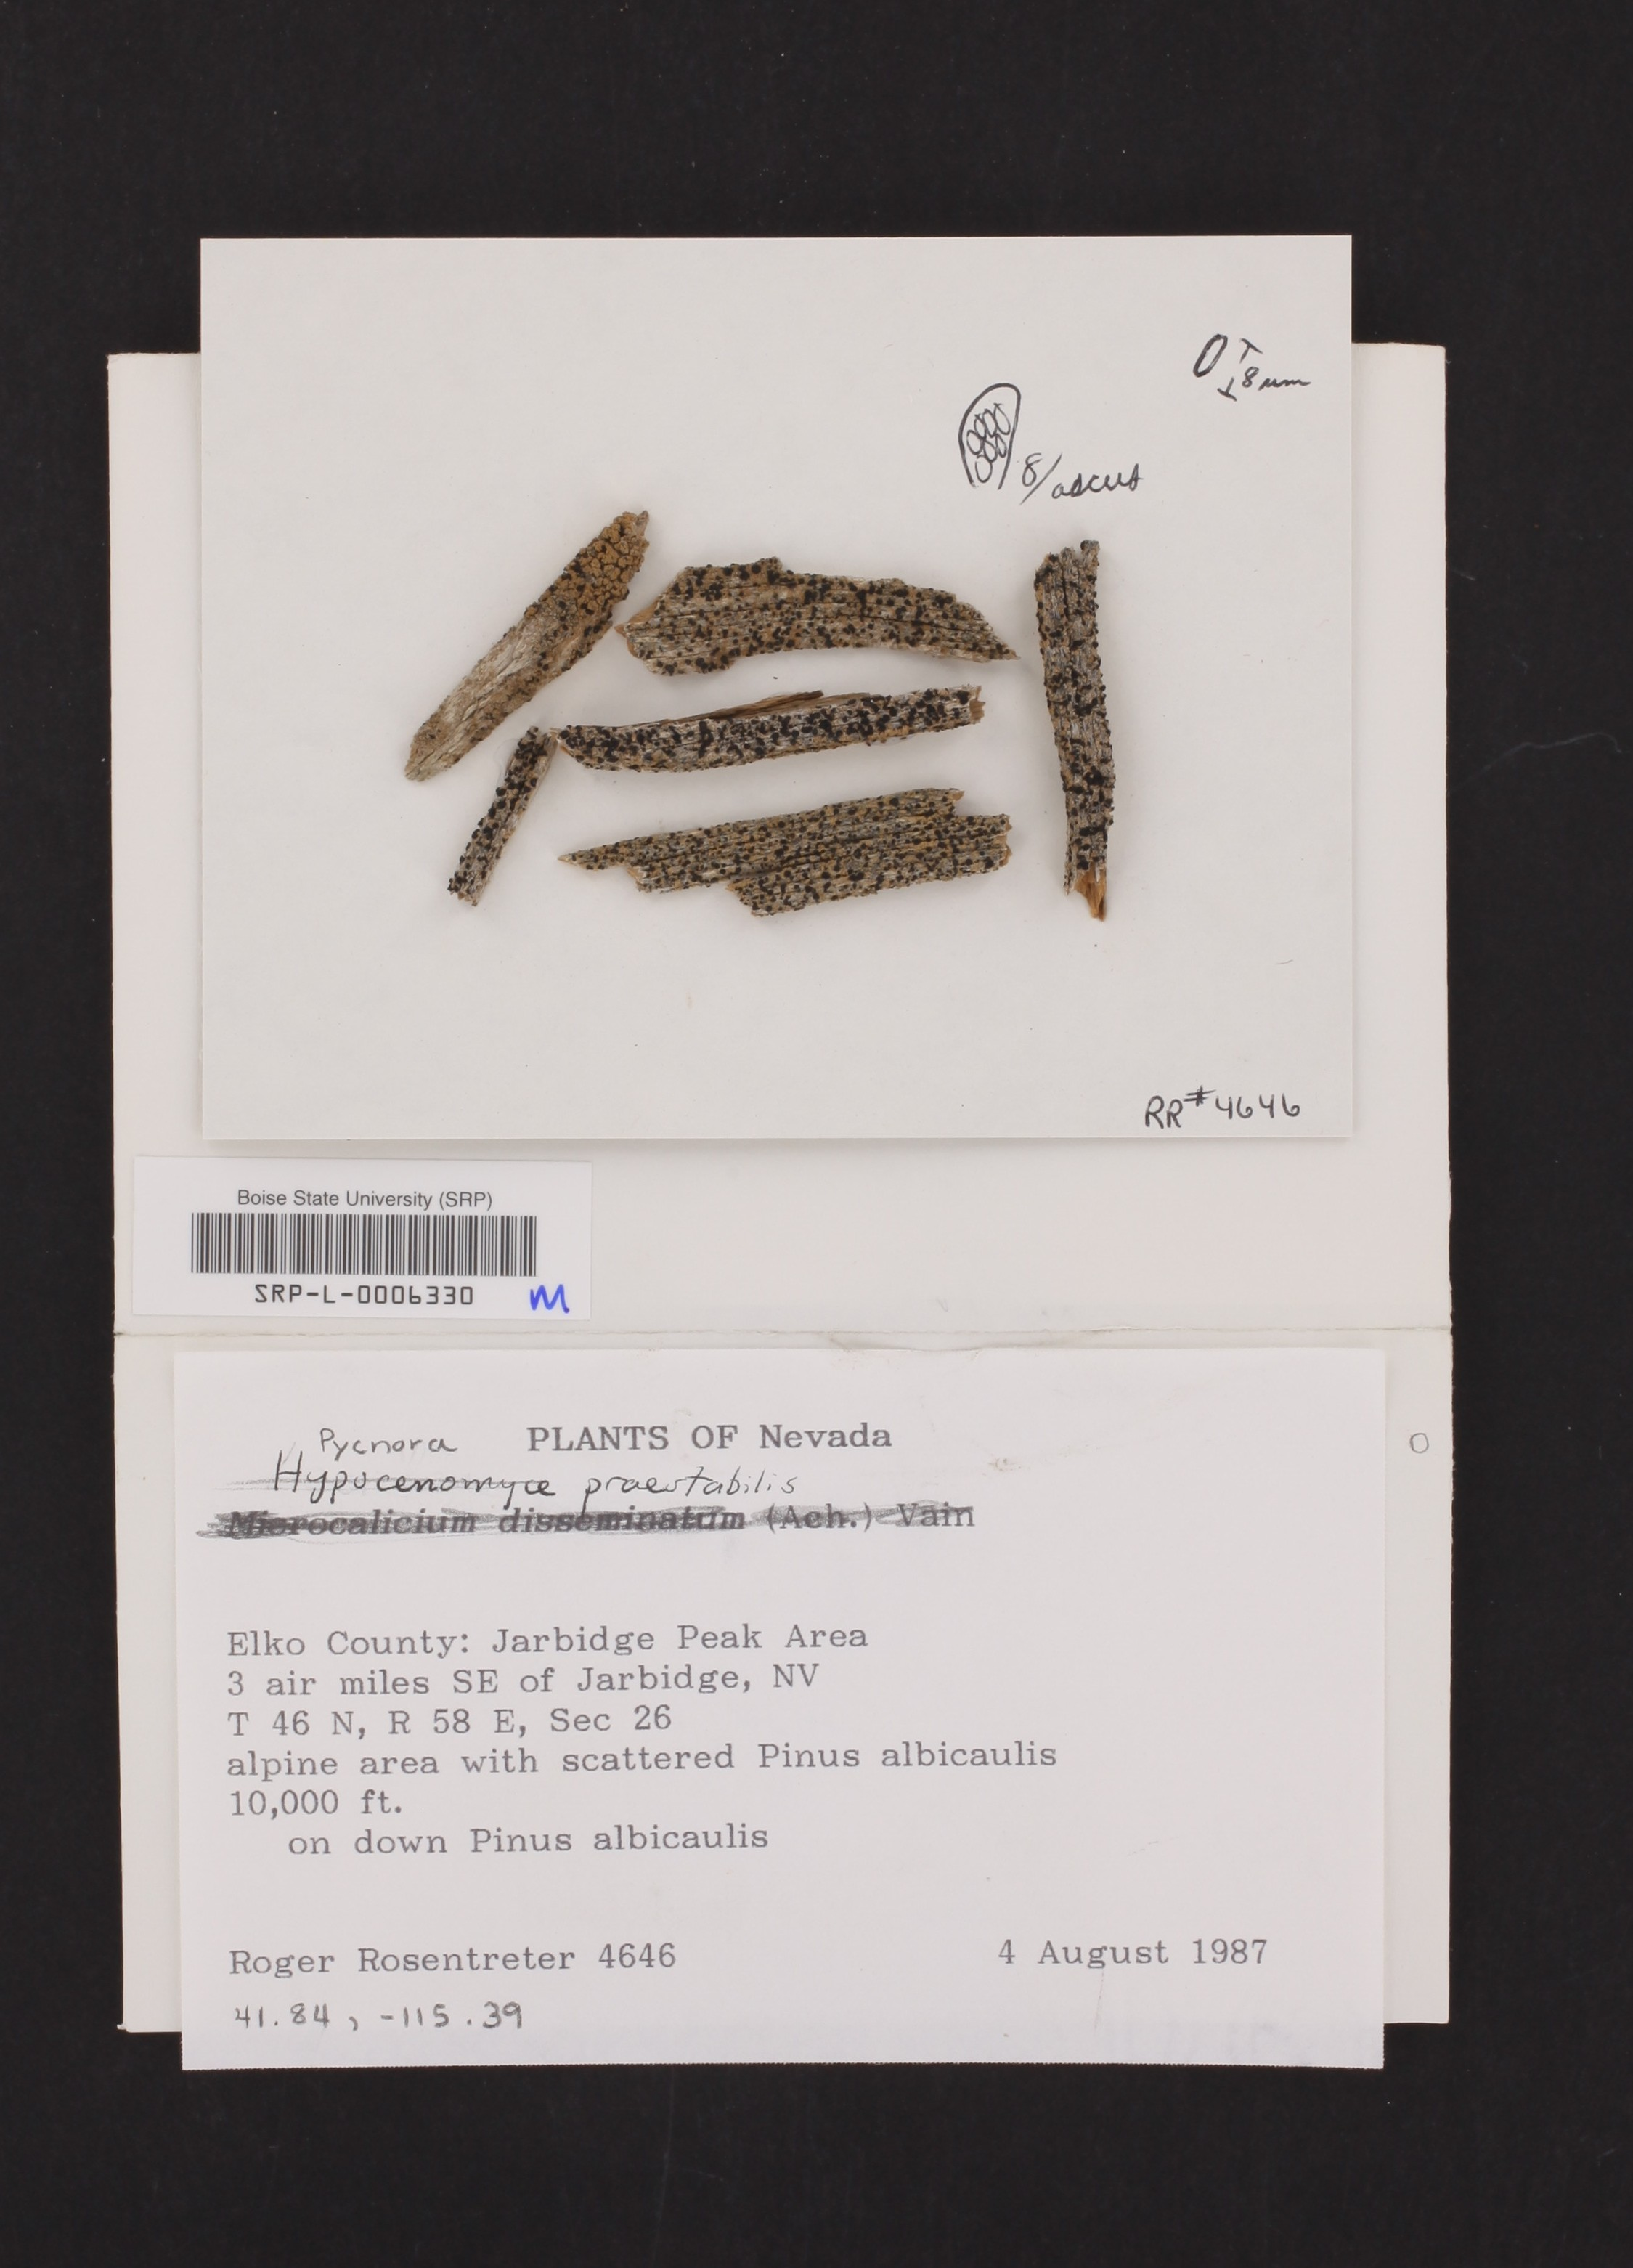 Pycnora praestabilis image